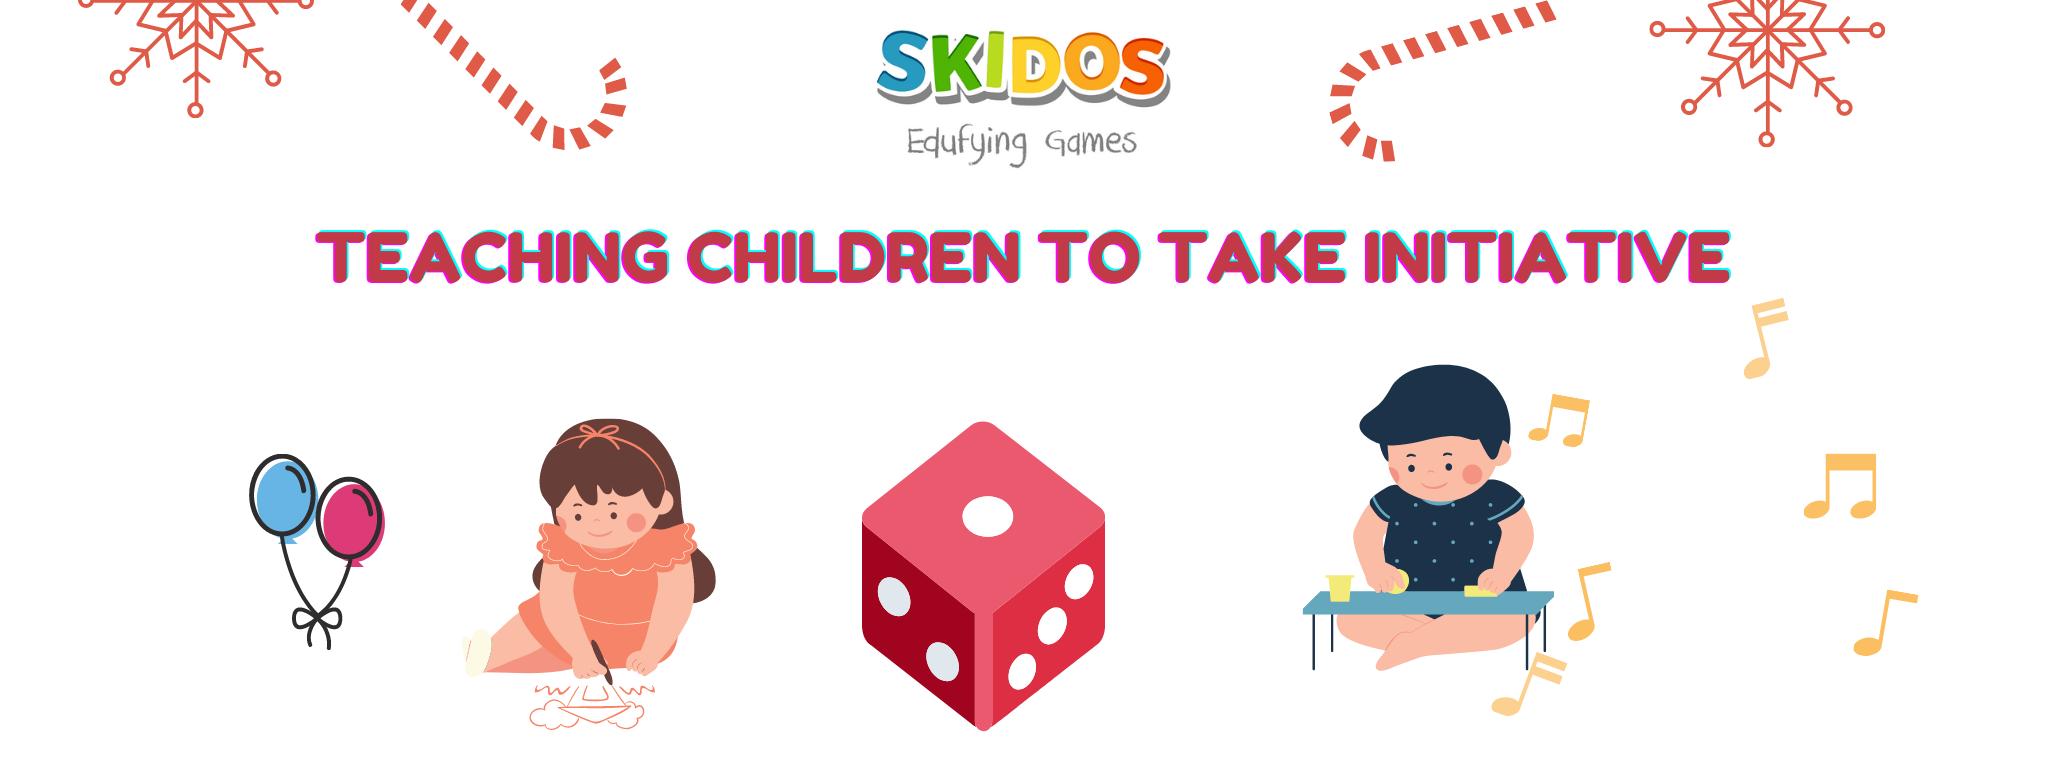 Teaching children to take initiative: How to? 5 Easy Ways!